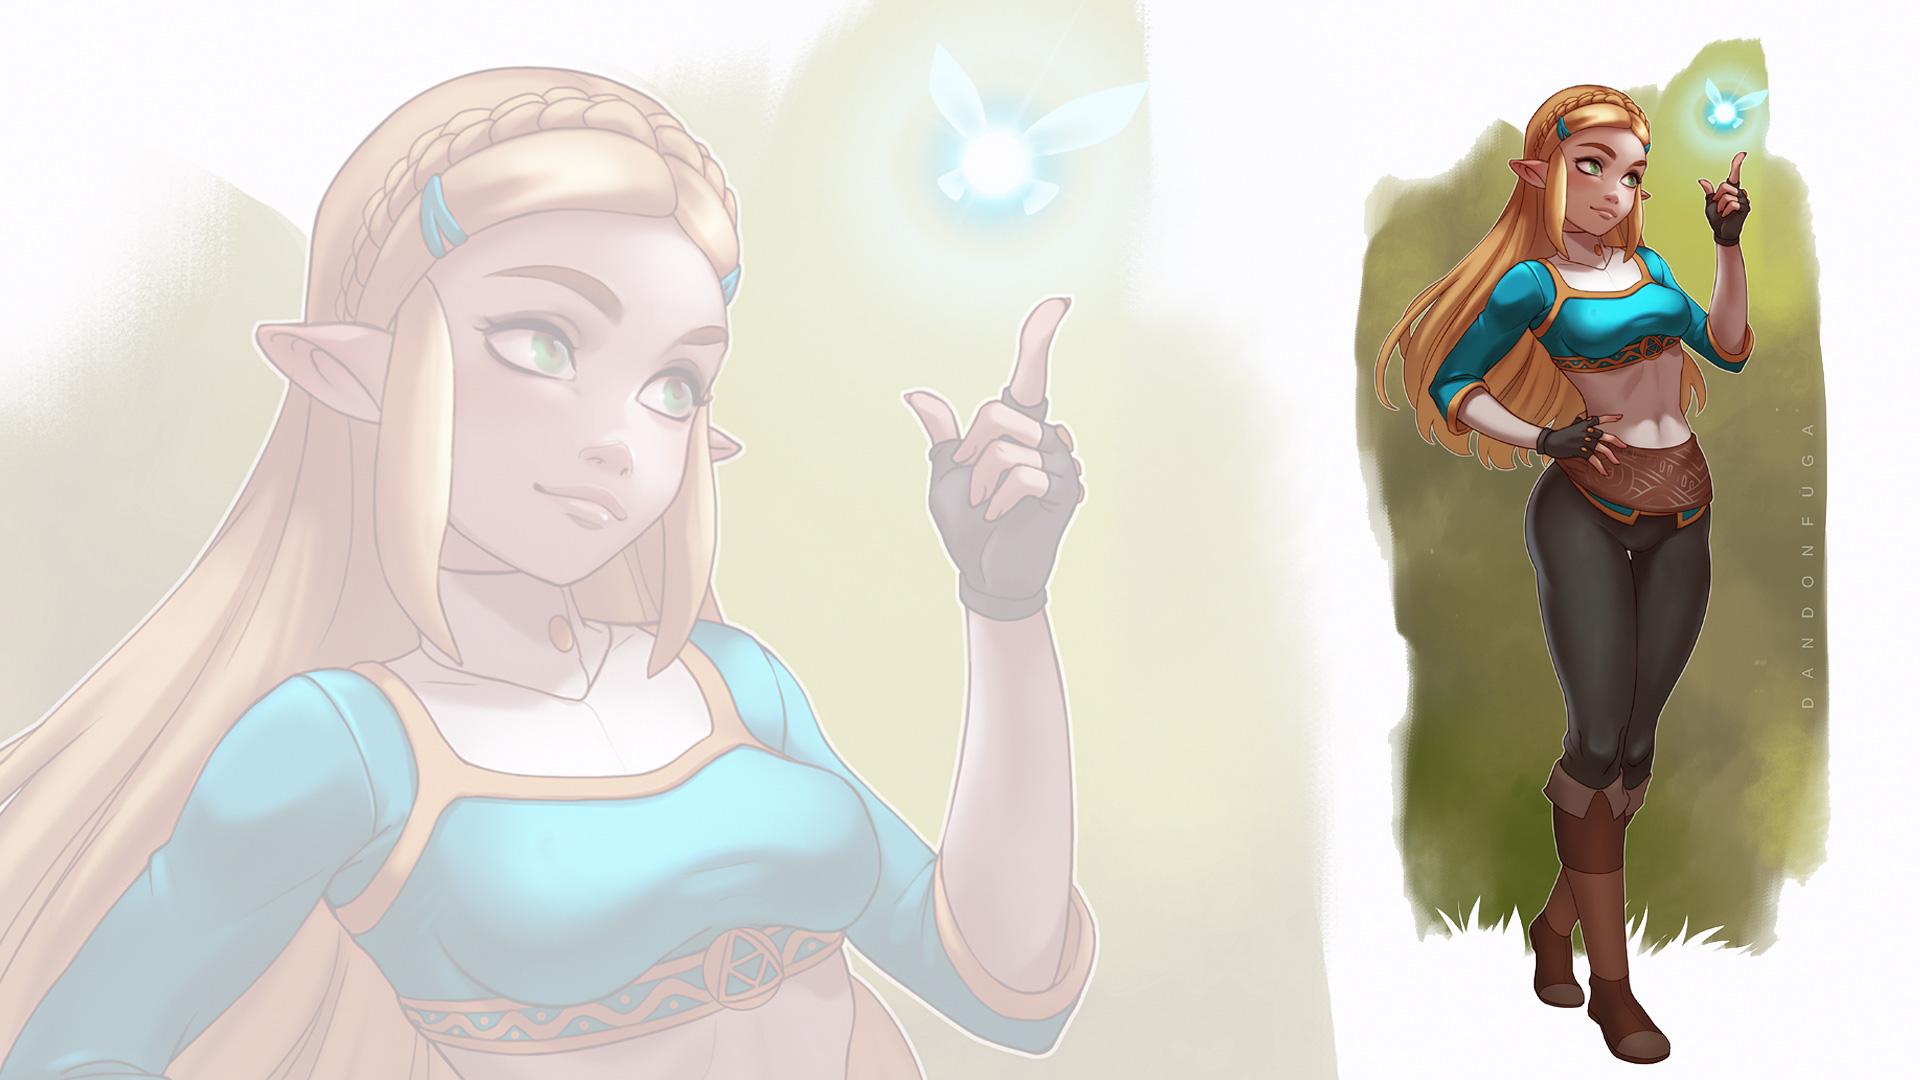 General 1920x1080 dandon fuga Princess Zelda The Legend of Zelda Zelda The Legend of Zelda: Breath of the Wild blonde pointed ears